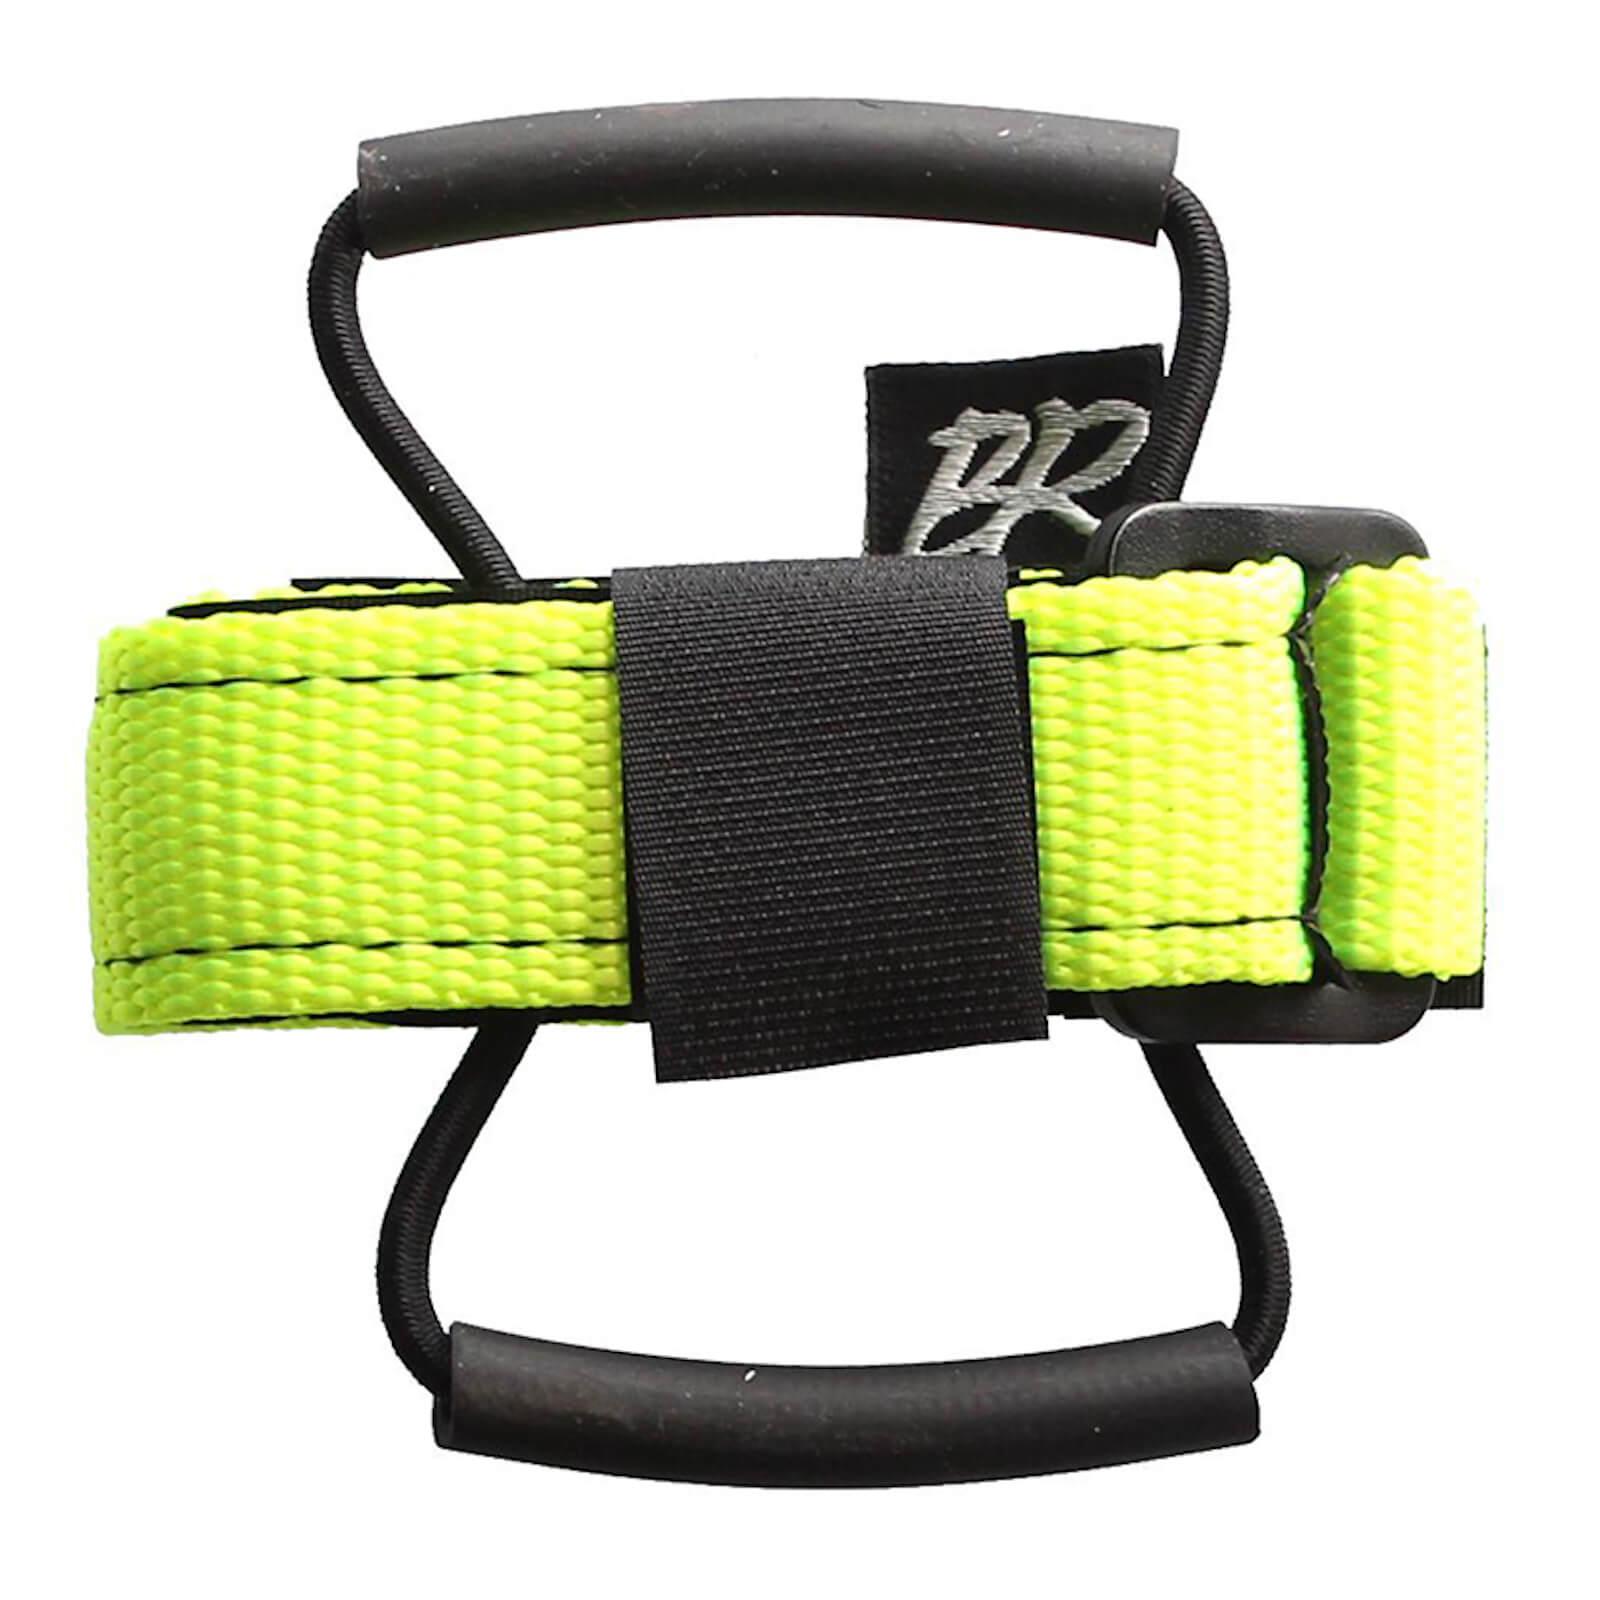 BackCountry Camrat Strap - Blaze Yellow